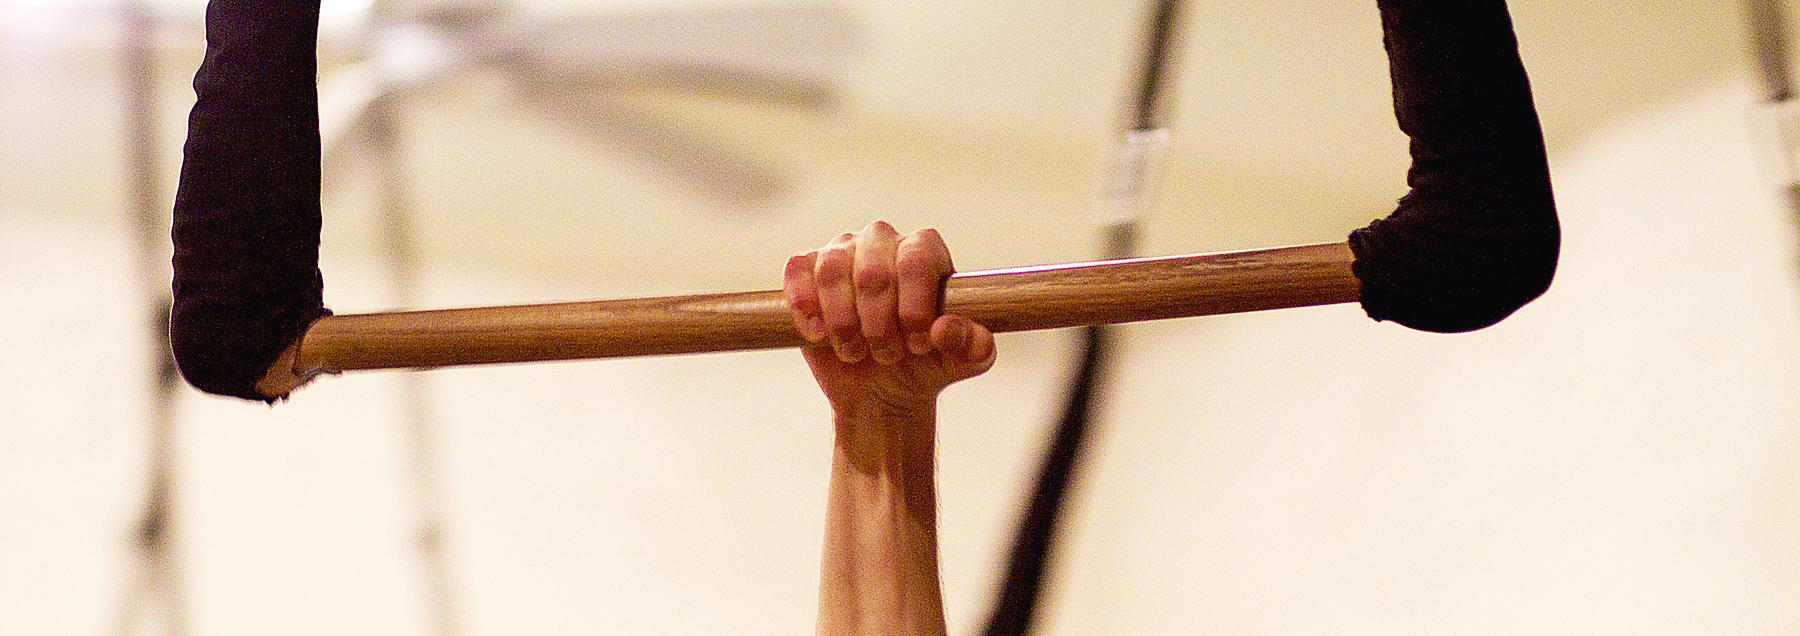 ArmGripTrap.jpg